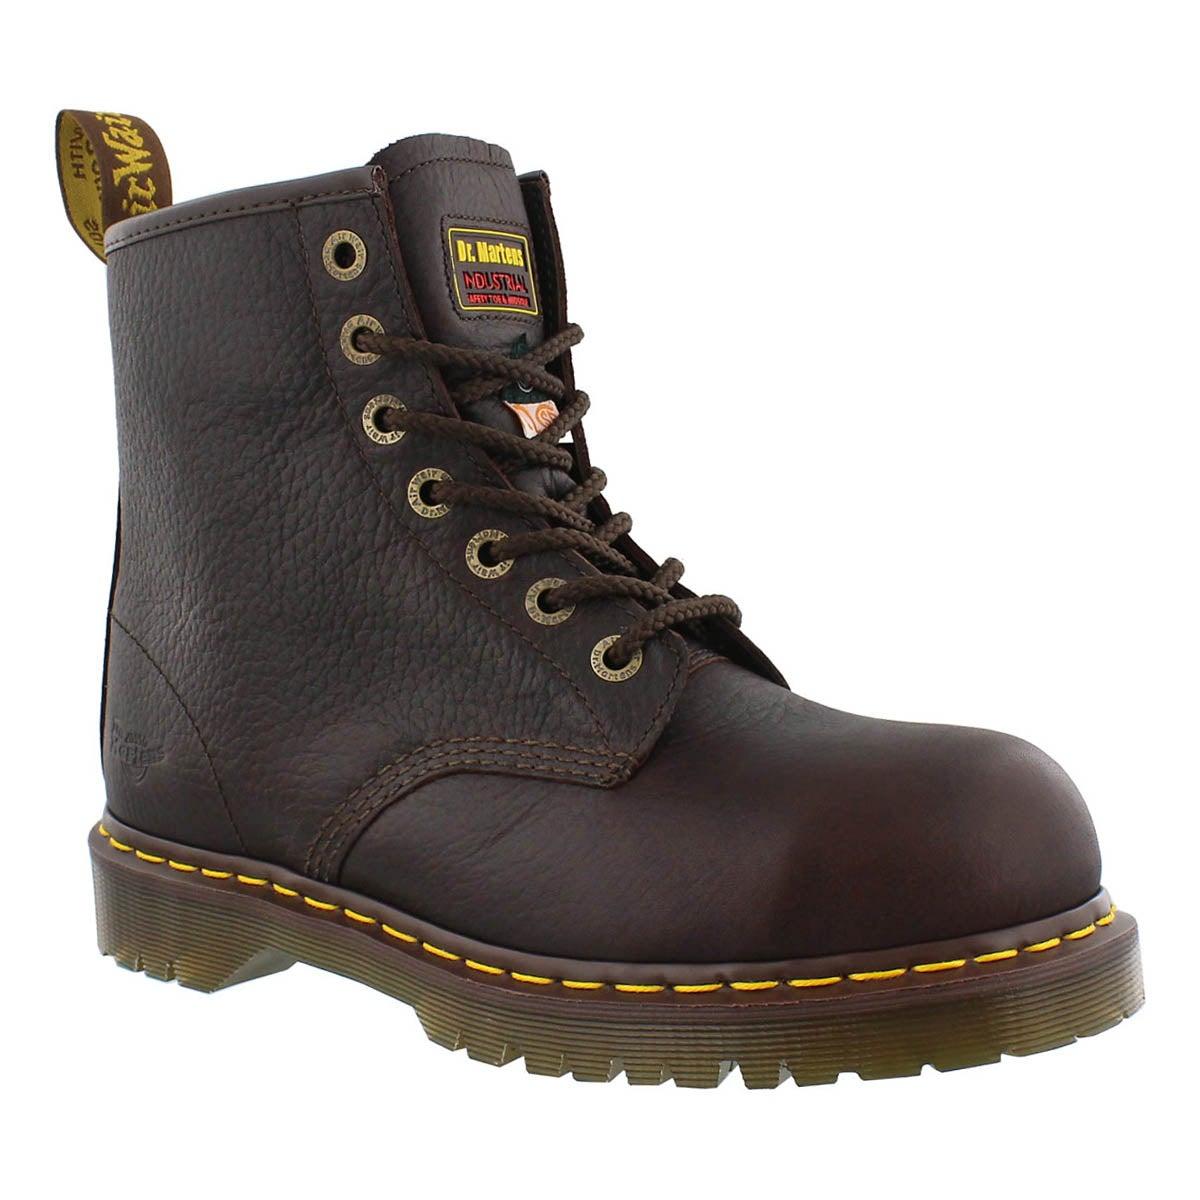 Men's ICON 7B10 ST bark CSA safety boots